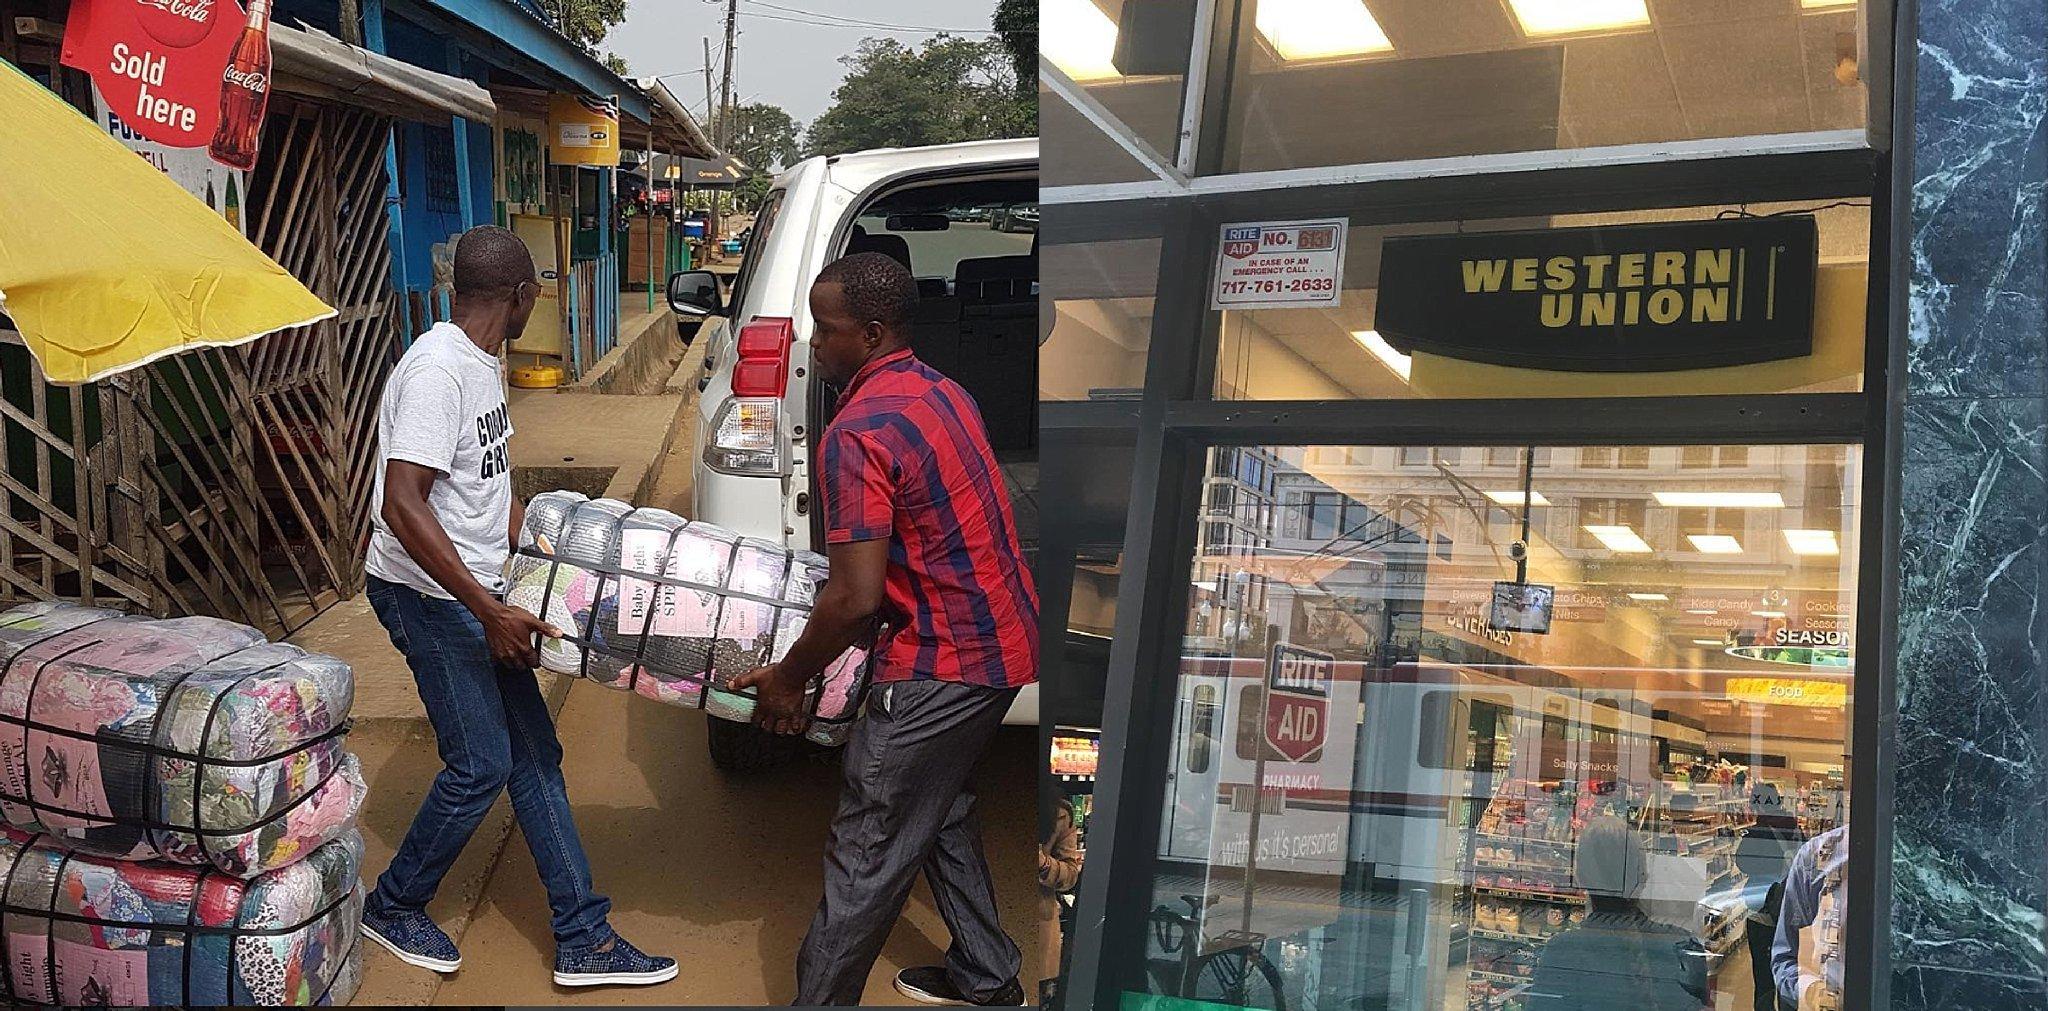 internet scam liberia turns into answered prayers